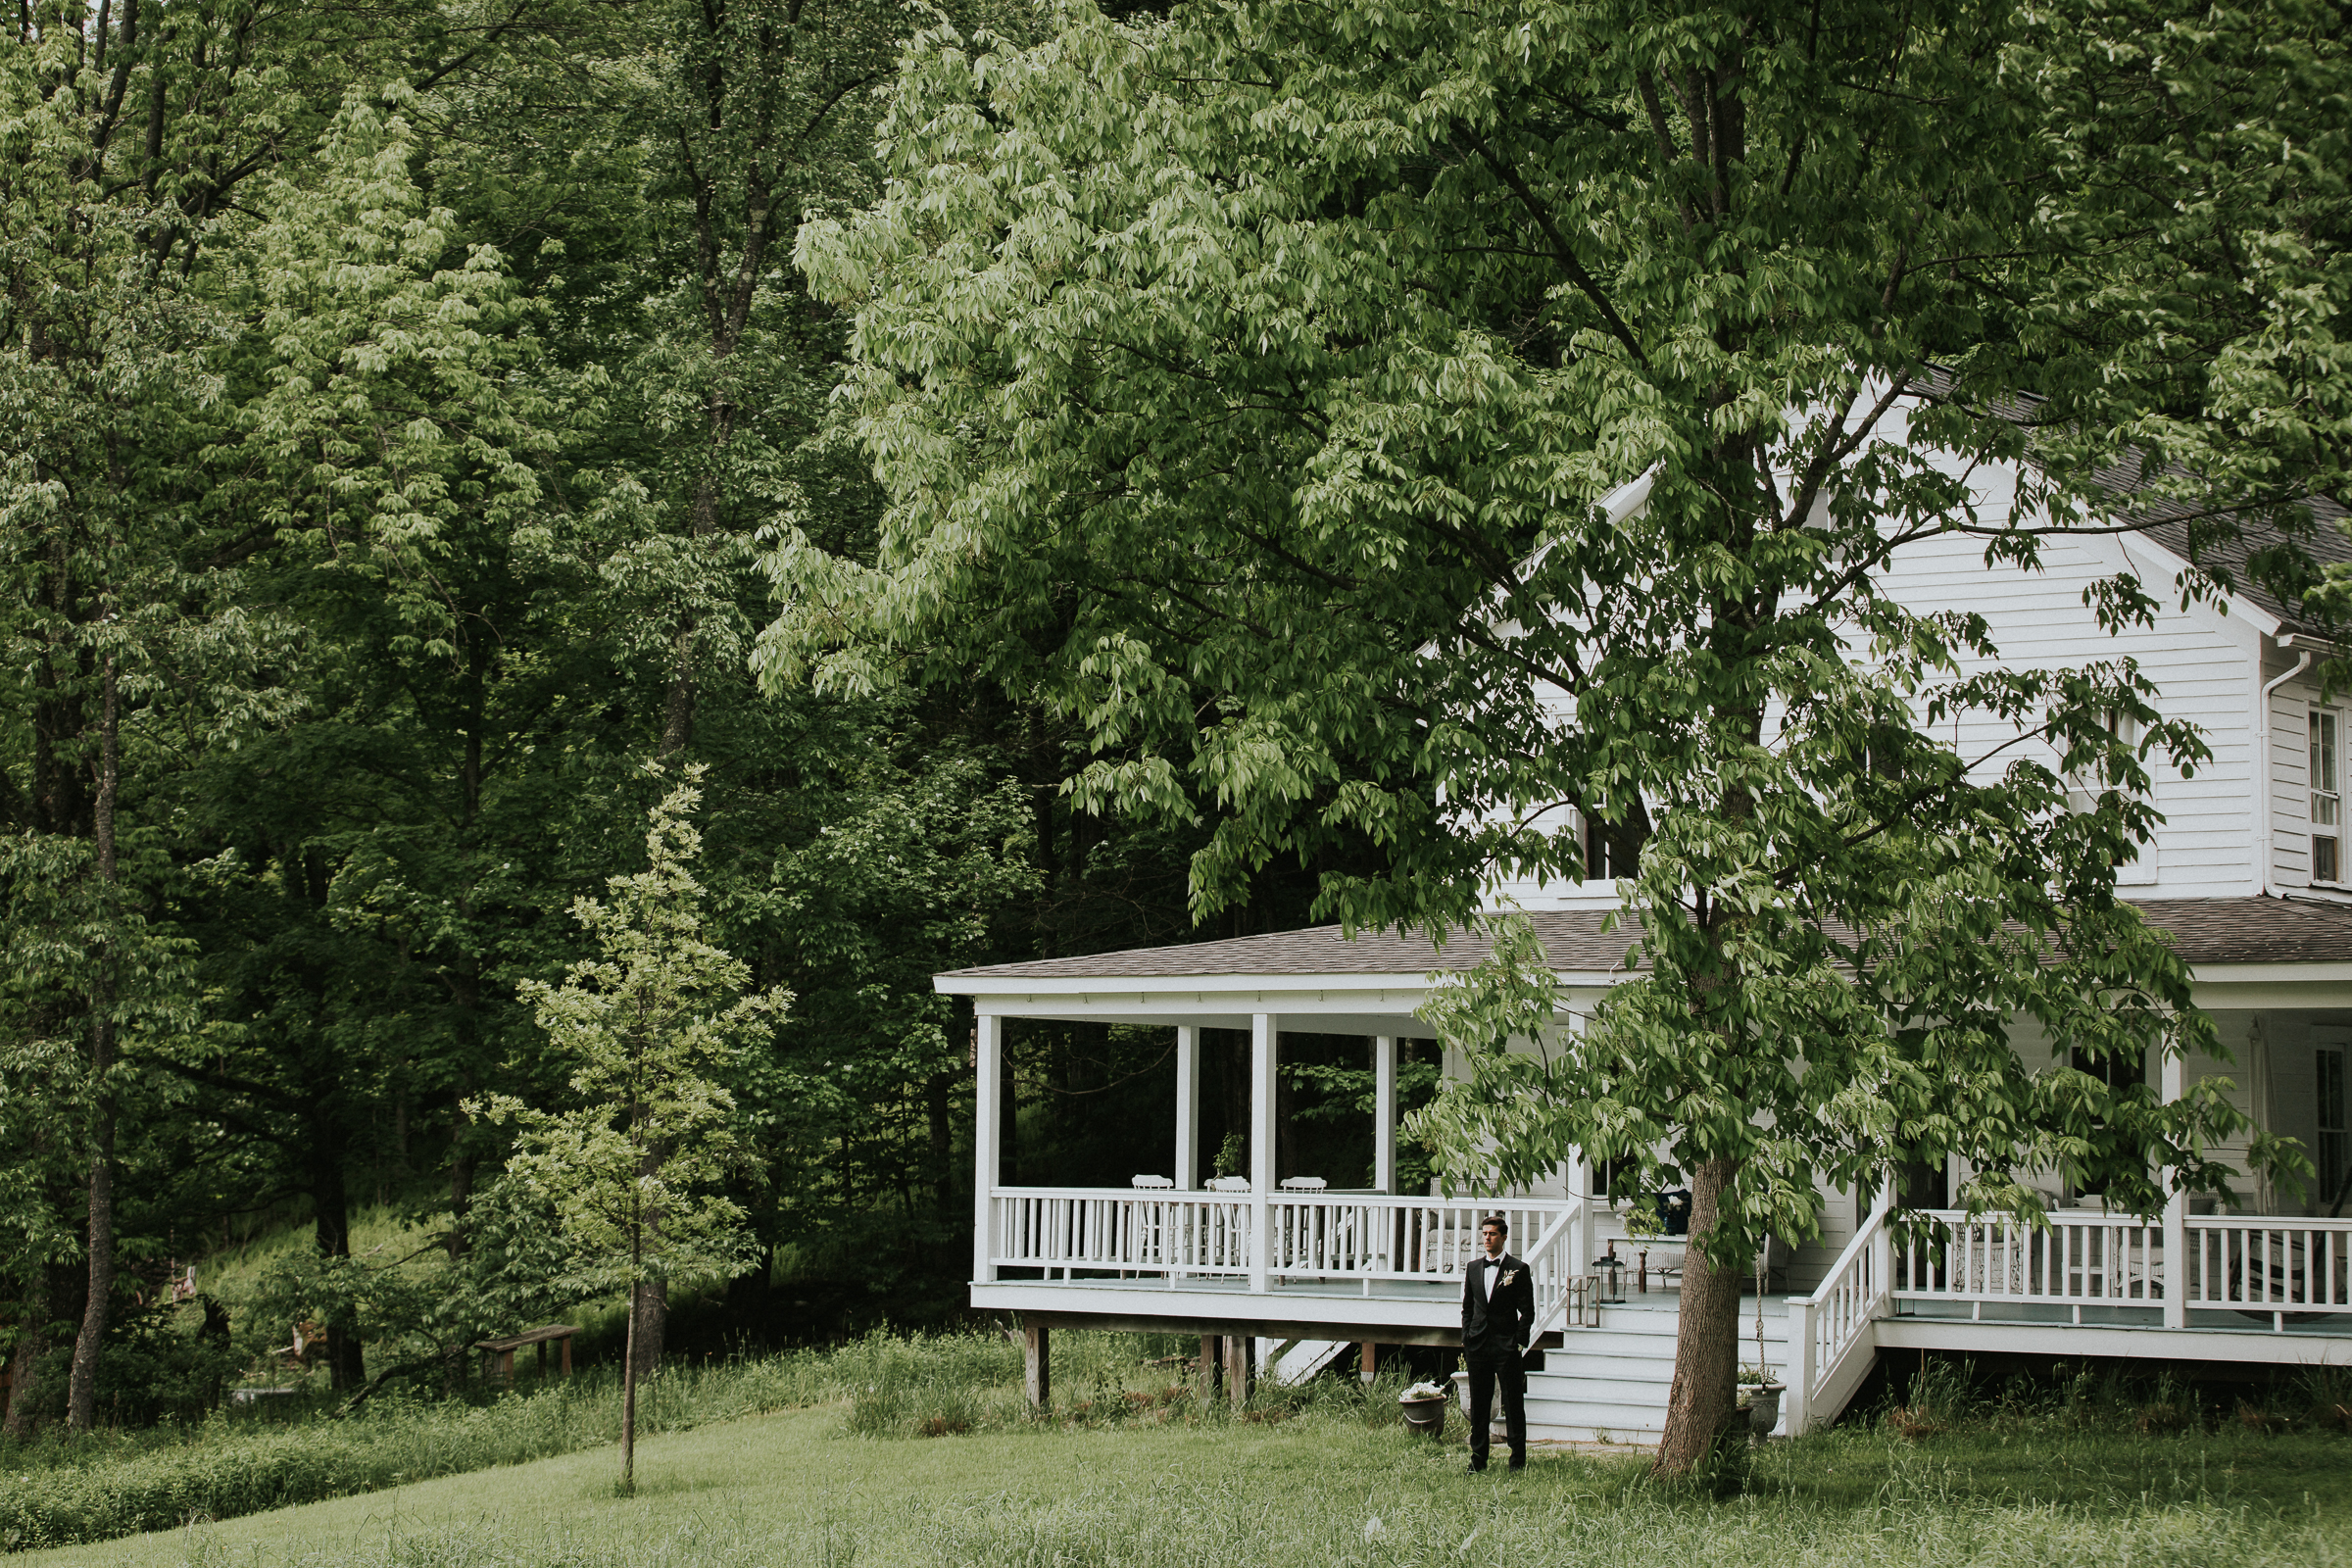 Handsome-Hollow-Long-Eddy-Catskills-New-York-Fine-Art-Documentary-Wedding-Photographer-25.jpg